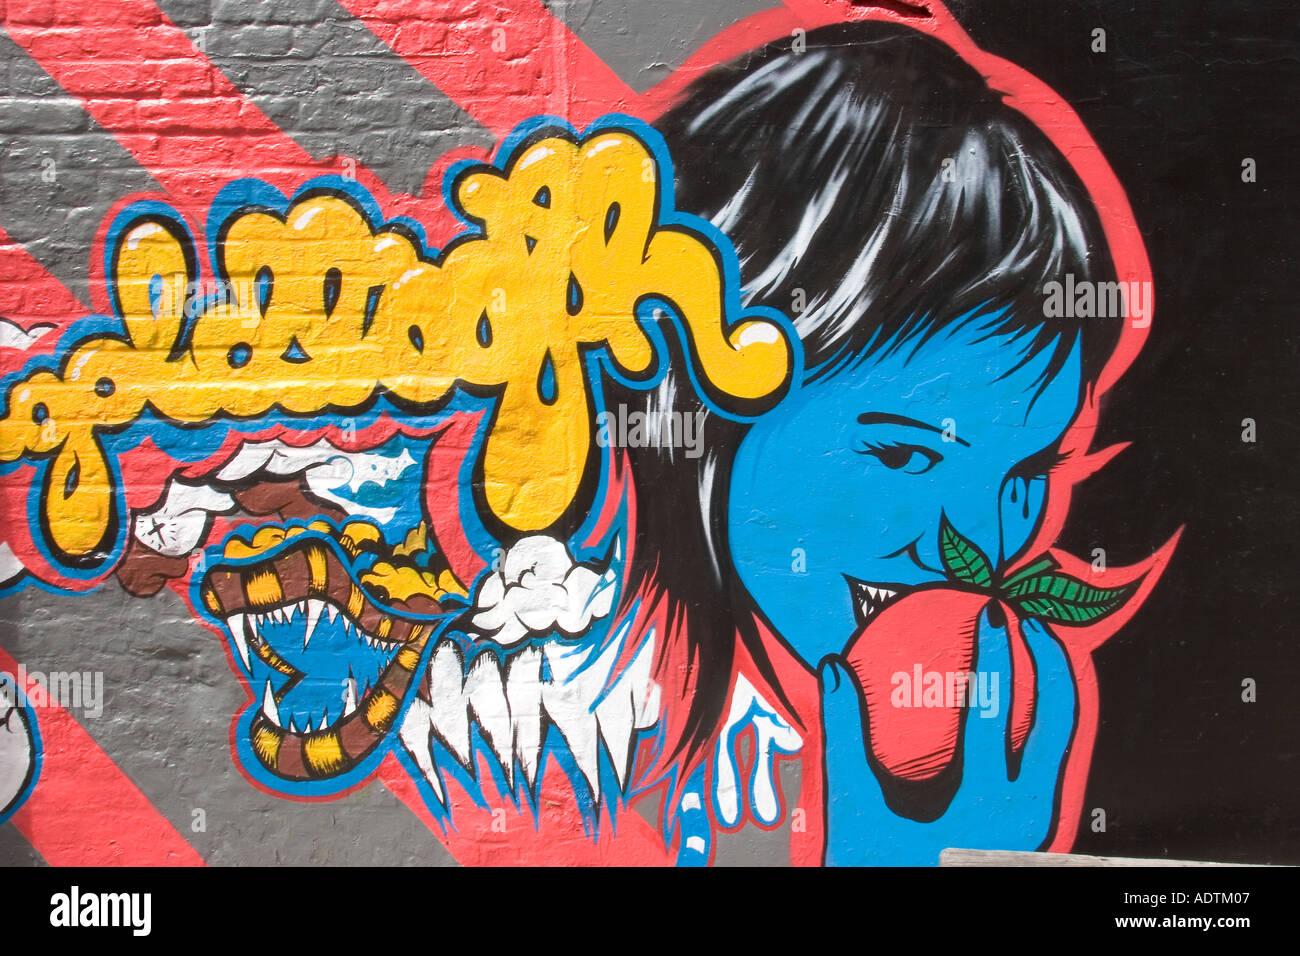 Street Mural  Hoxton London England UK - Stock Image